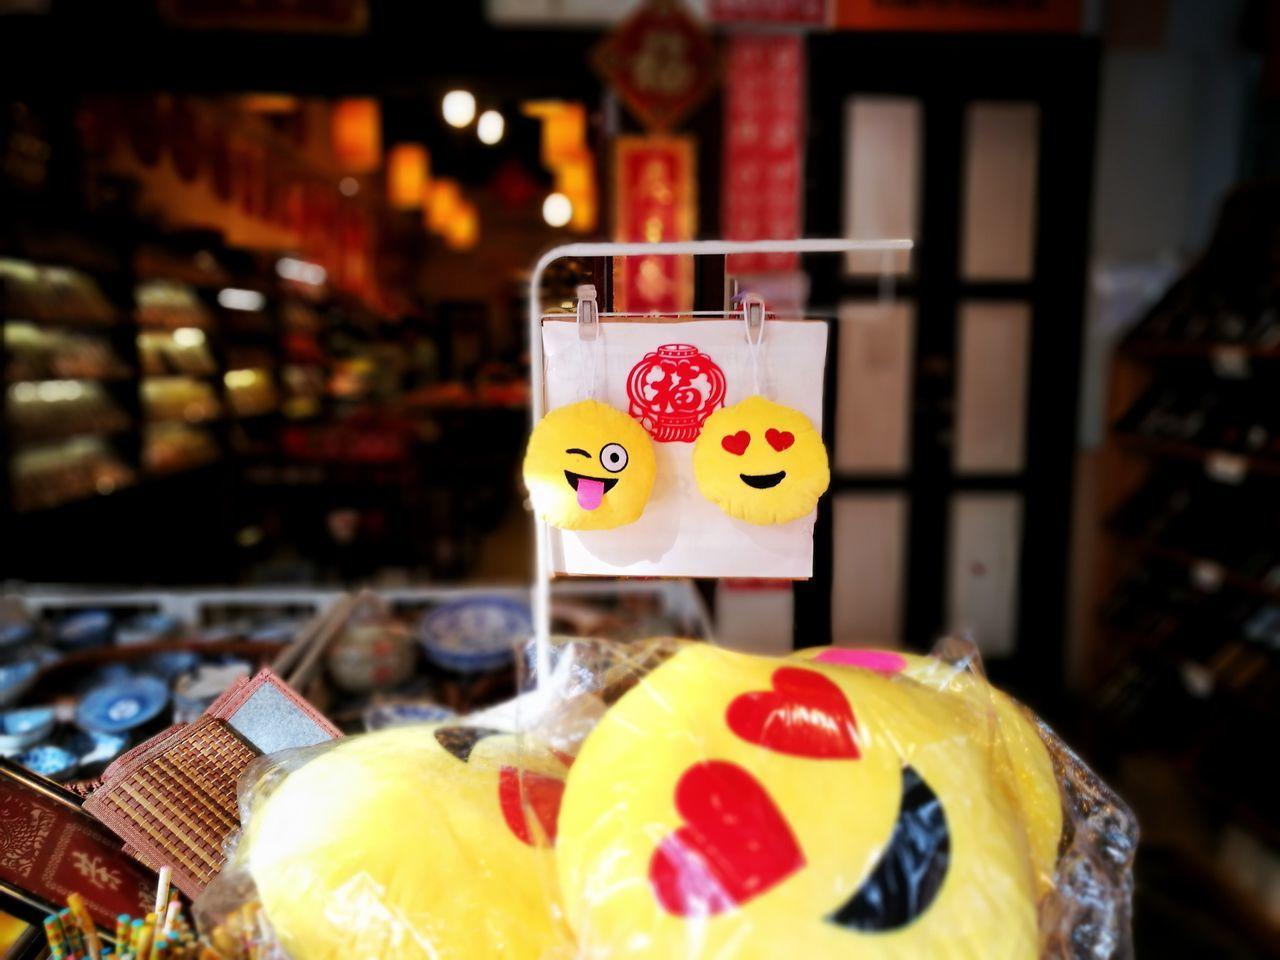 Street Photography Emojis The Week Of Eyeem Street Photography Yellow Goods